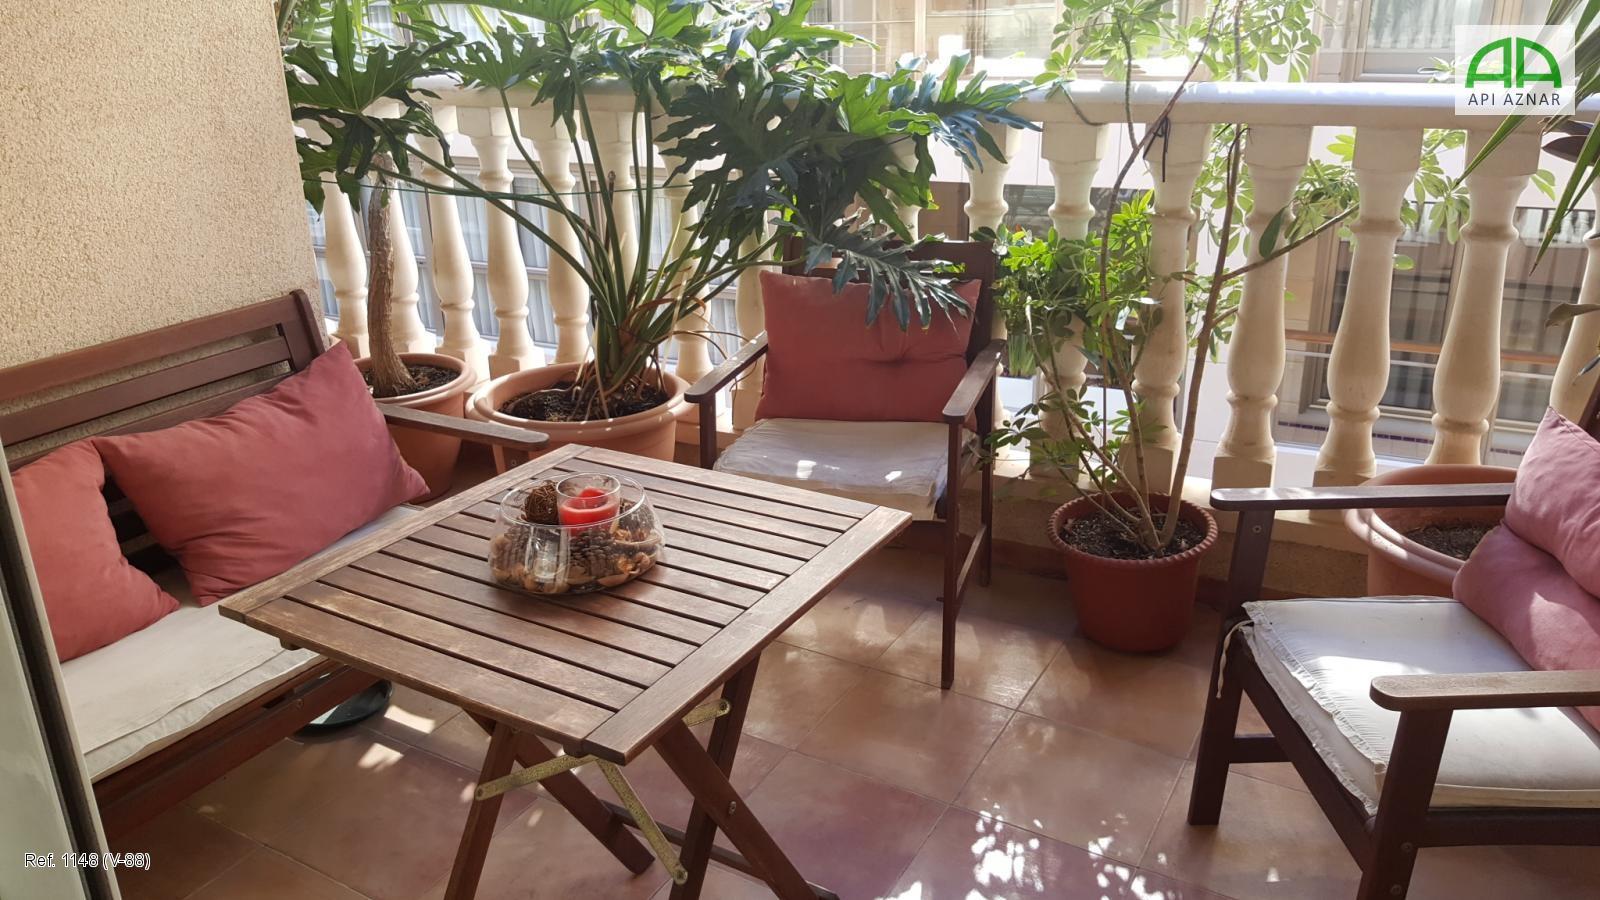 Asunnot myynnissä  Calle Clavel, (Torrevieja), 114.200 €